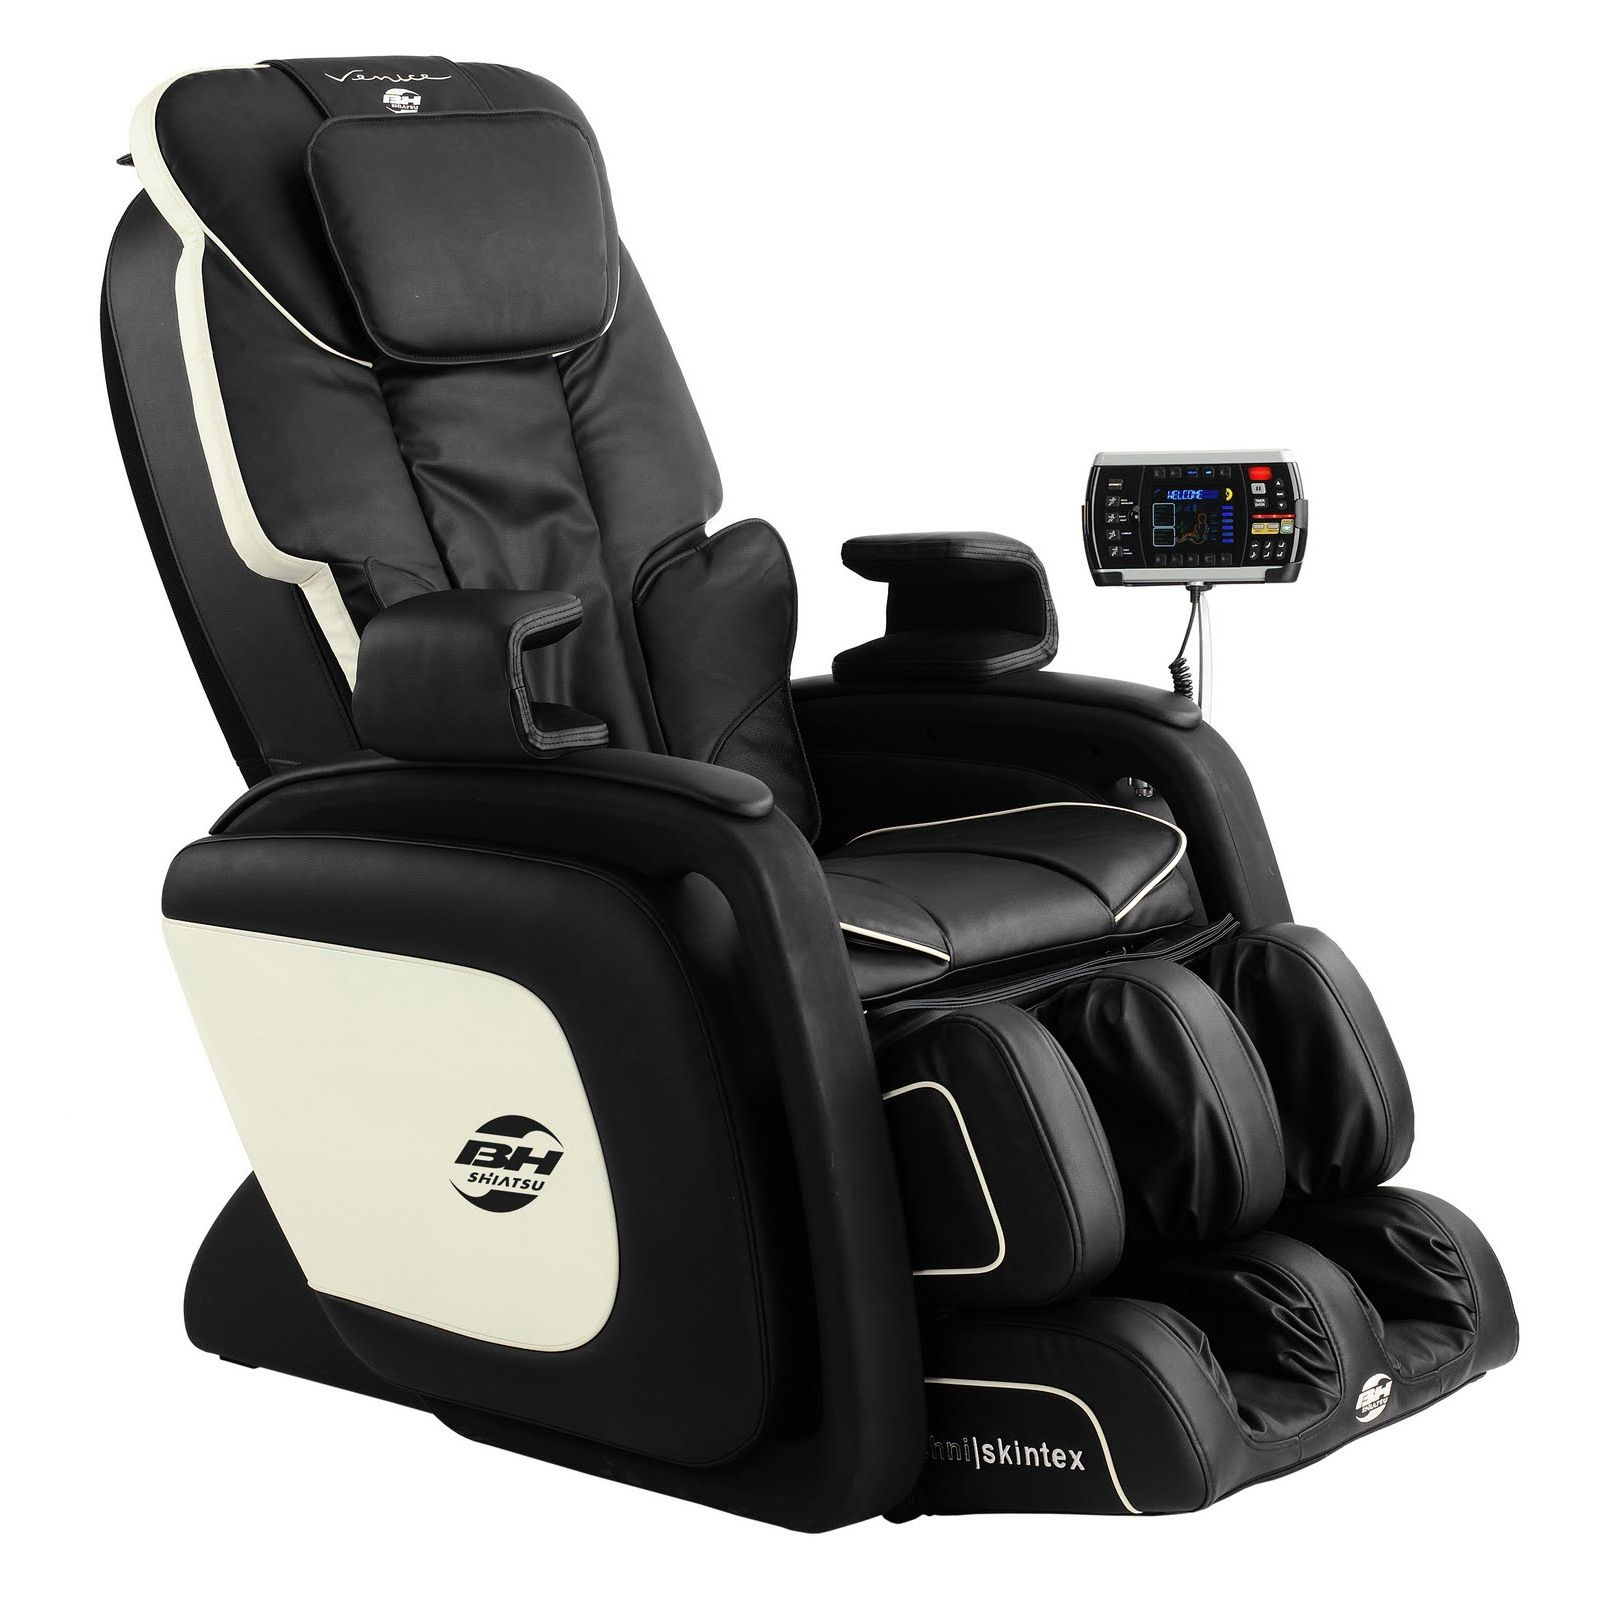 BH Shiatsu M650 Venice Massage Chair  Sweatbandcom